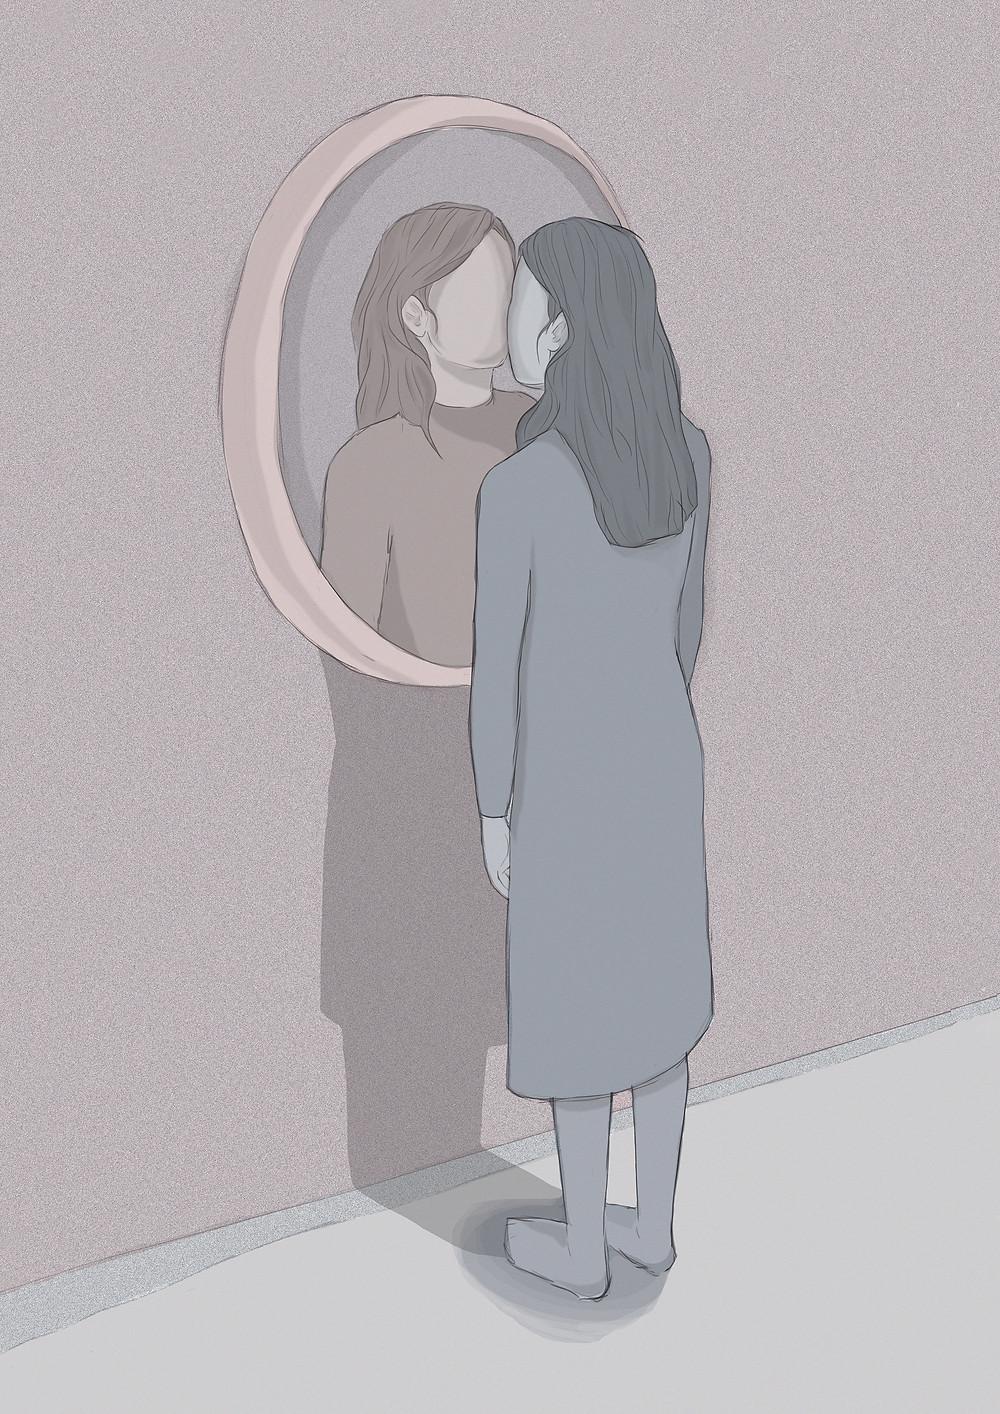 Artist Carlotta Mura's digital illustration of a girl lookin in the mirror